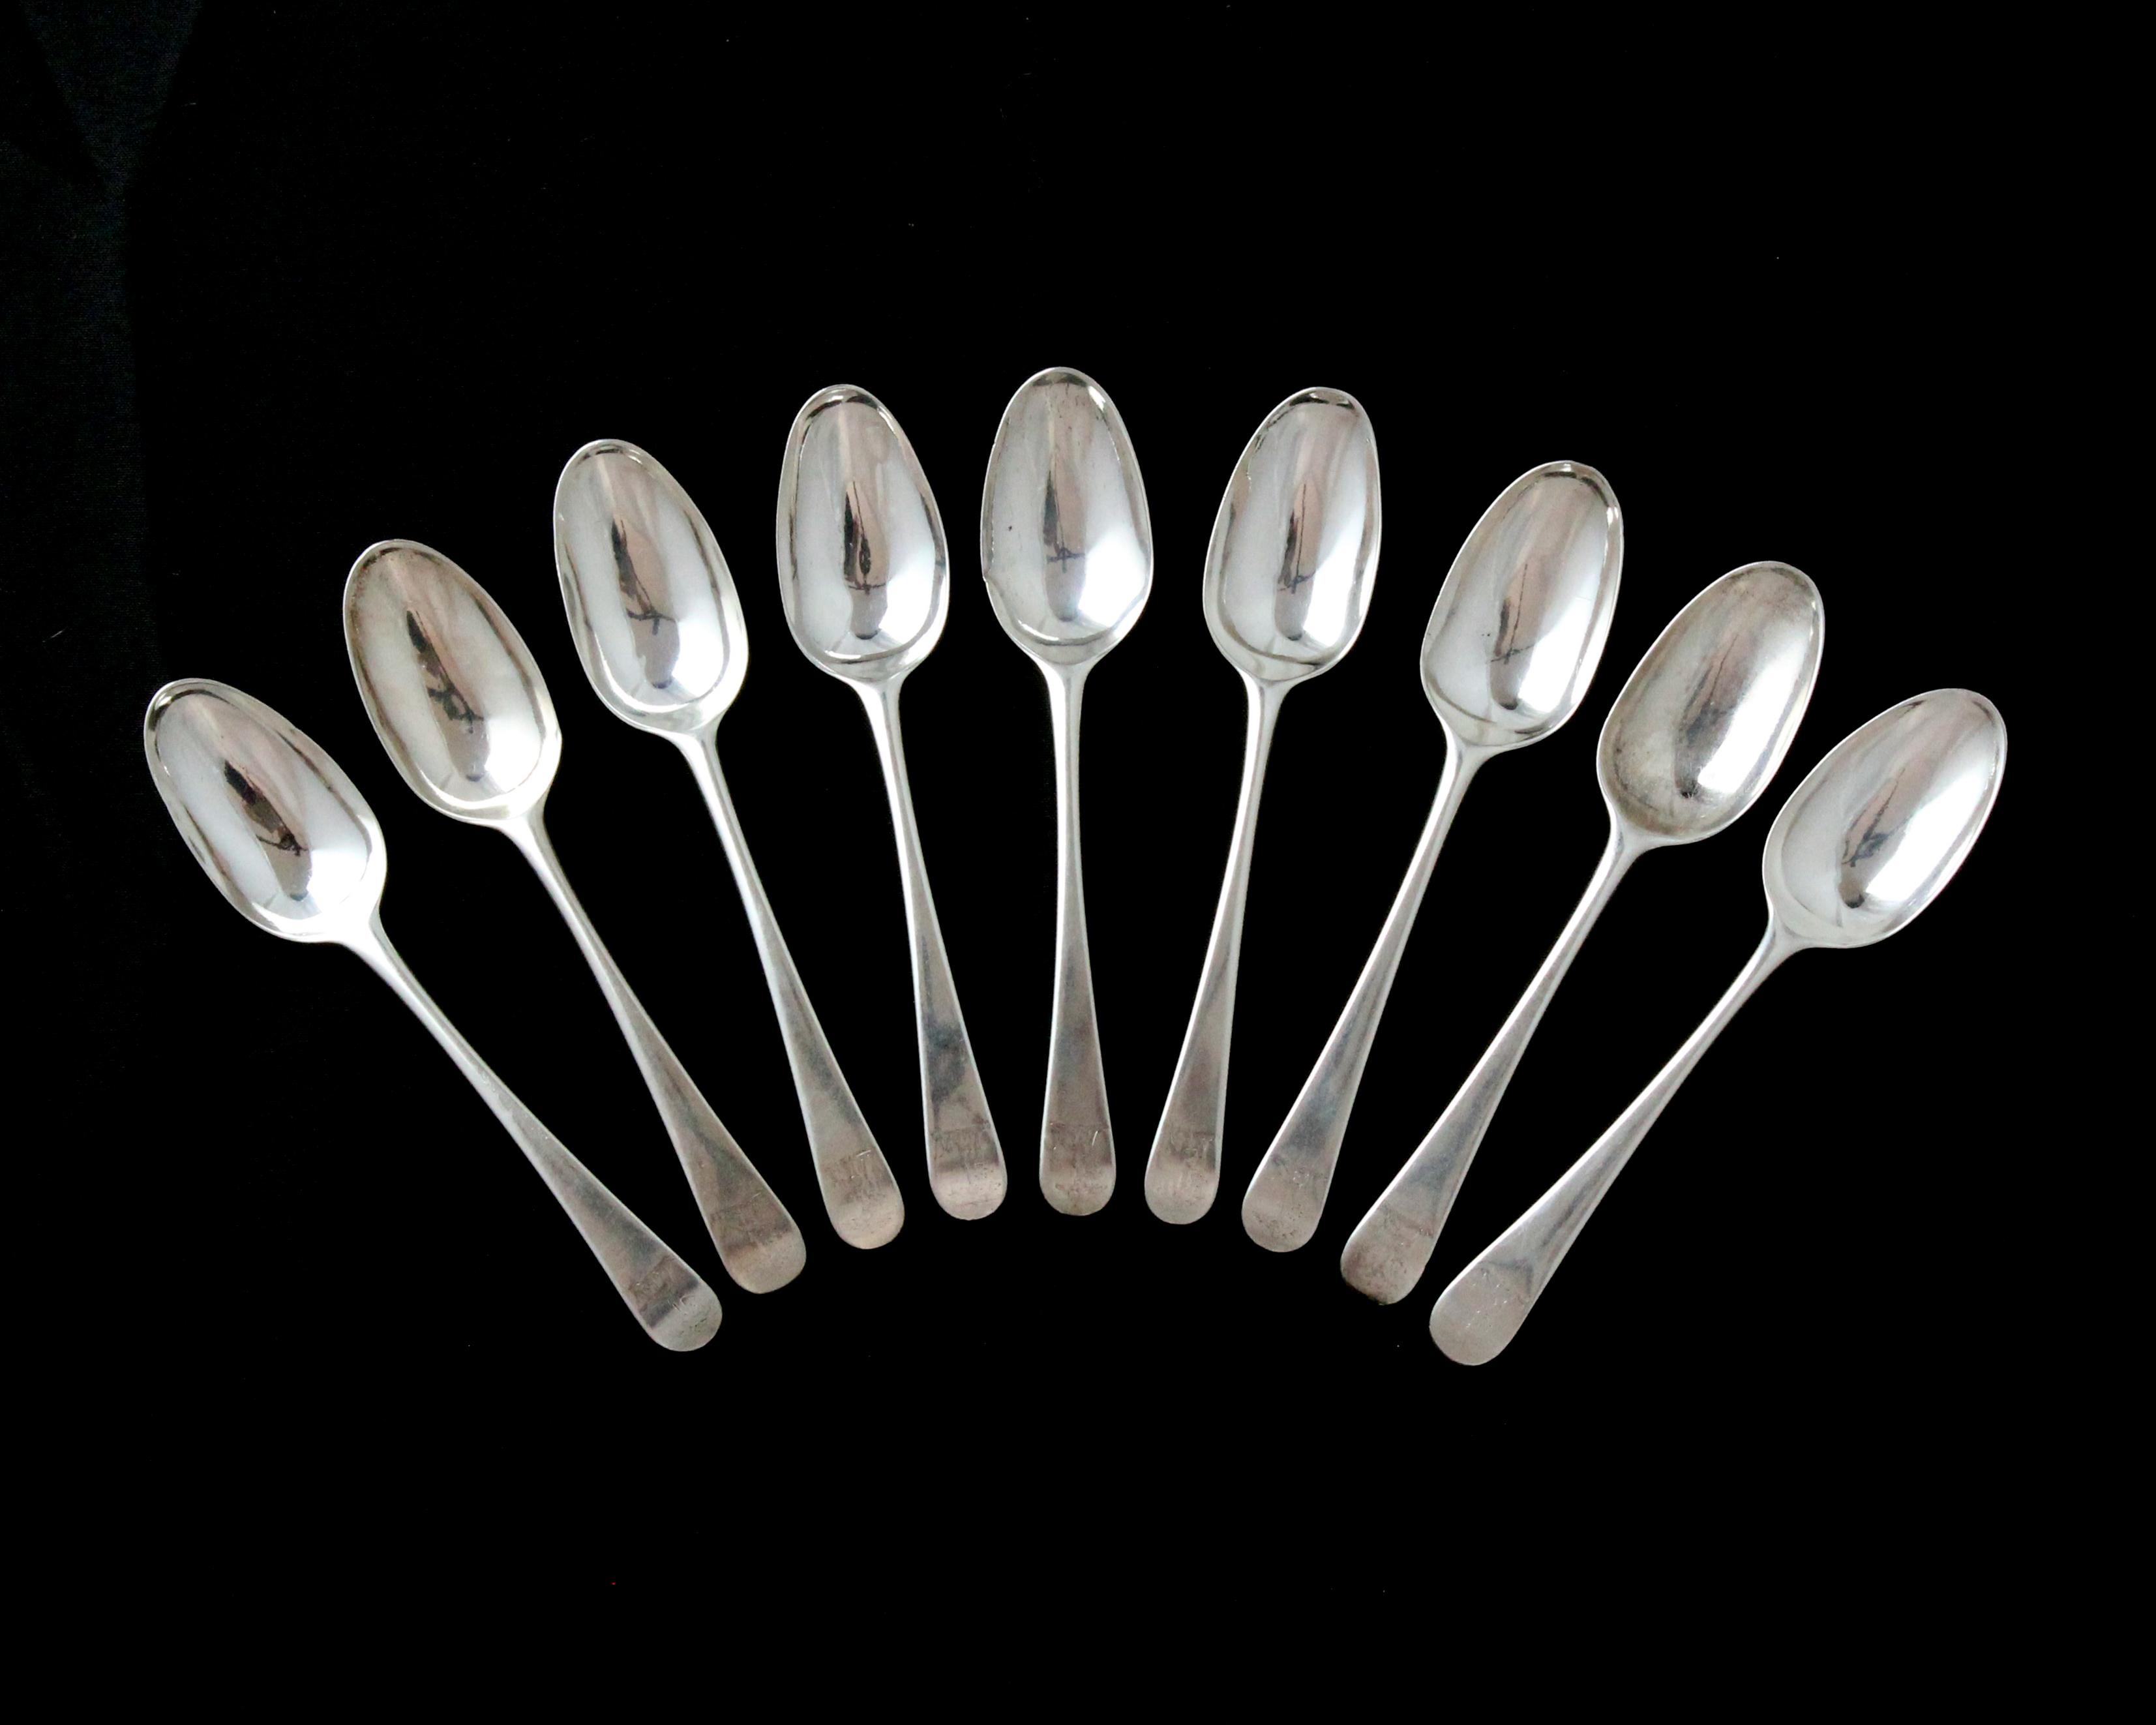 Los 3 - A set of nine antique George II Sterling Silver dessert spoons by Isaac Callard, London 1759 in